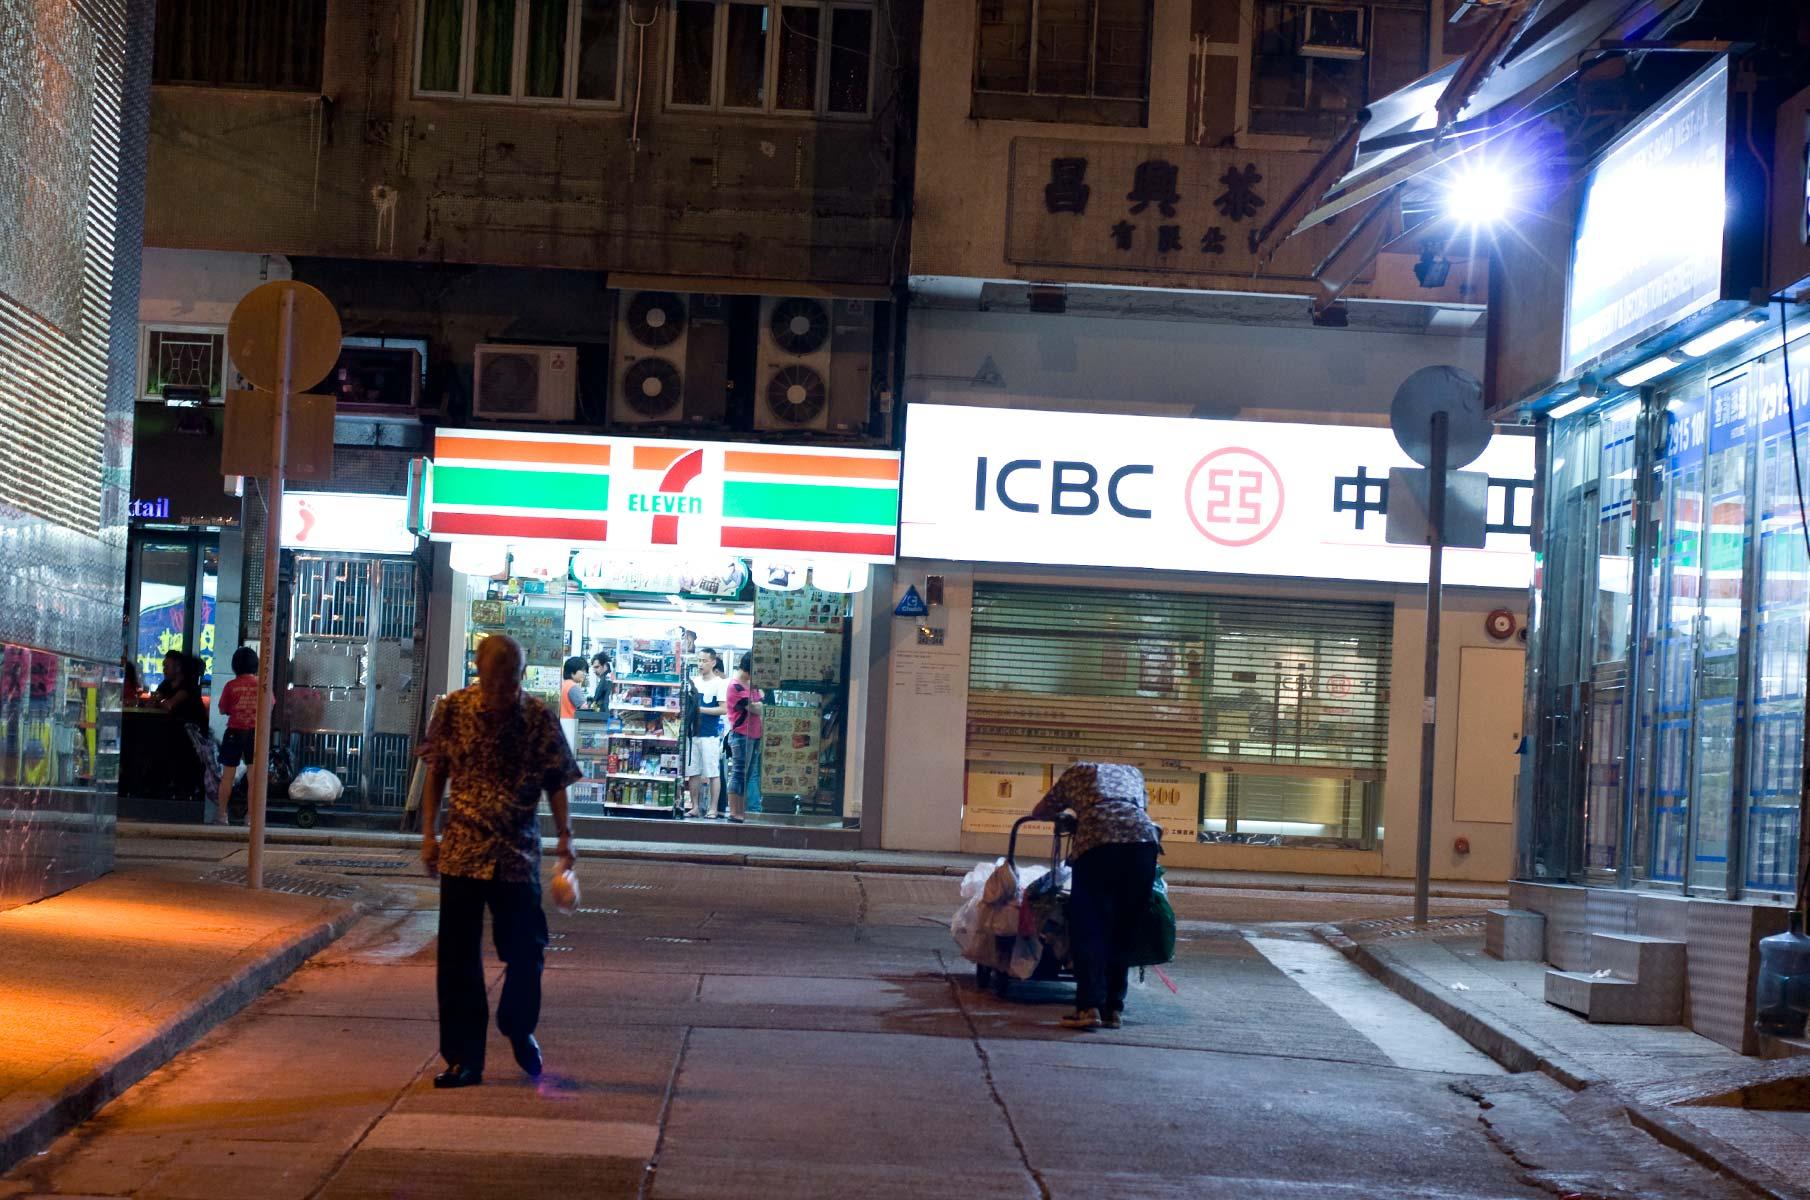 7eleven auf Hongkong Island bei Nacht